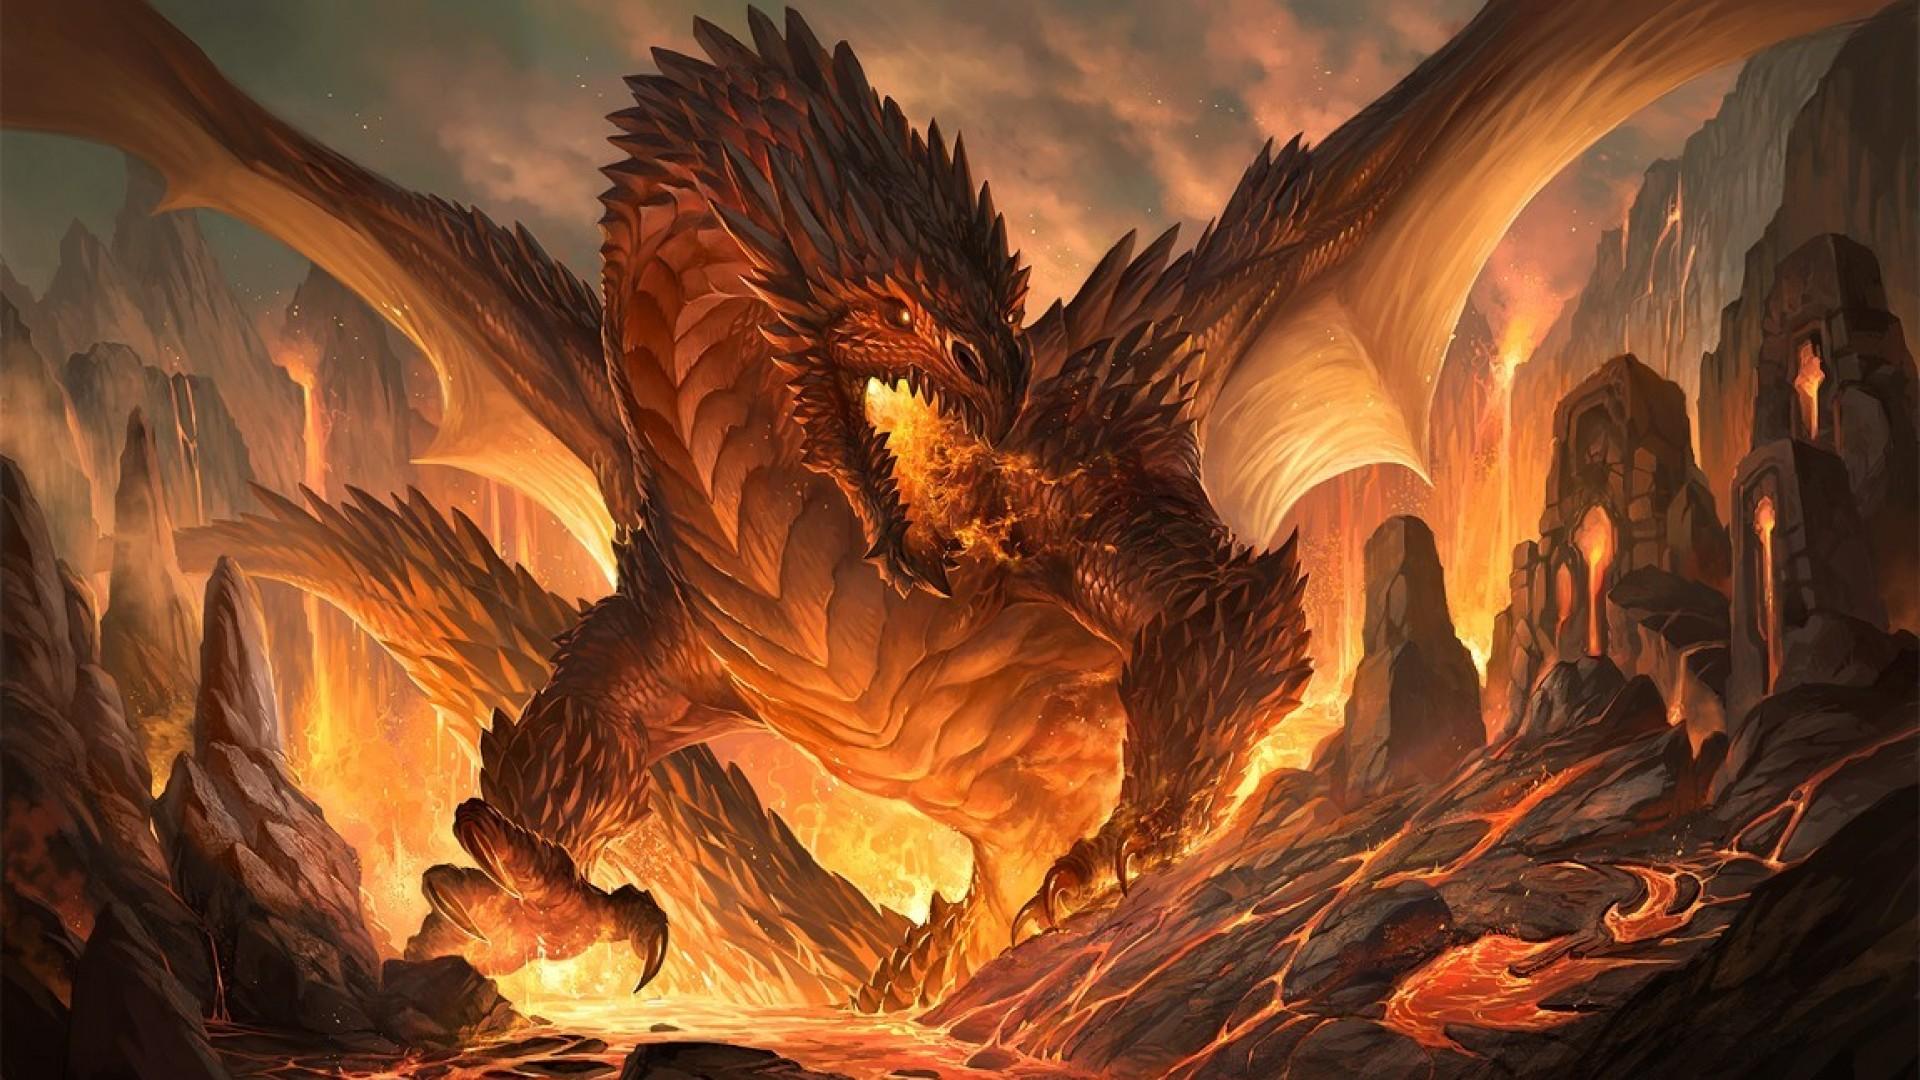 Dragon art fantasy art wallpaper dragon the hippest galleries